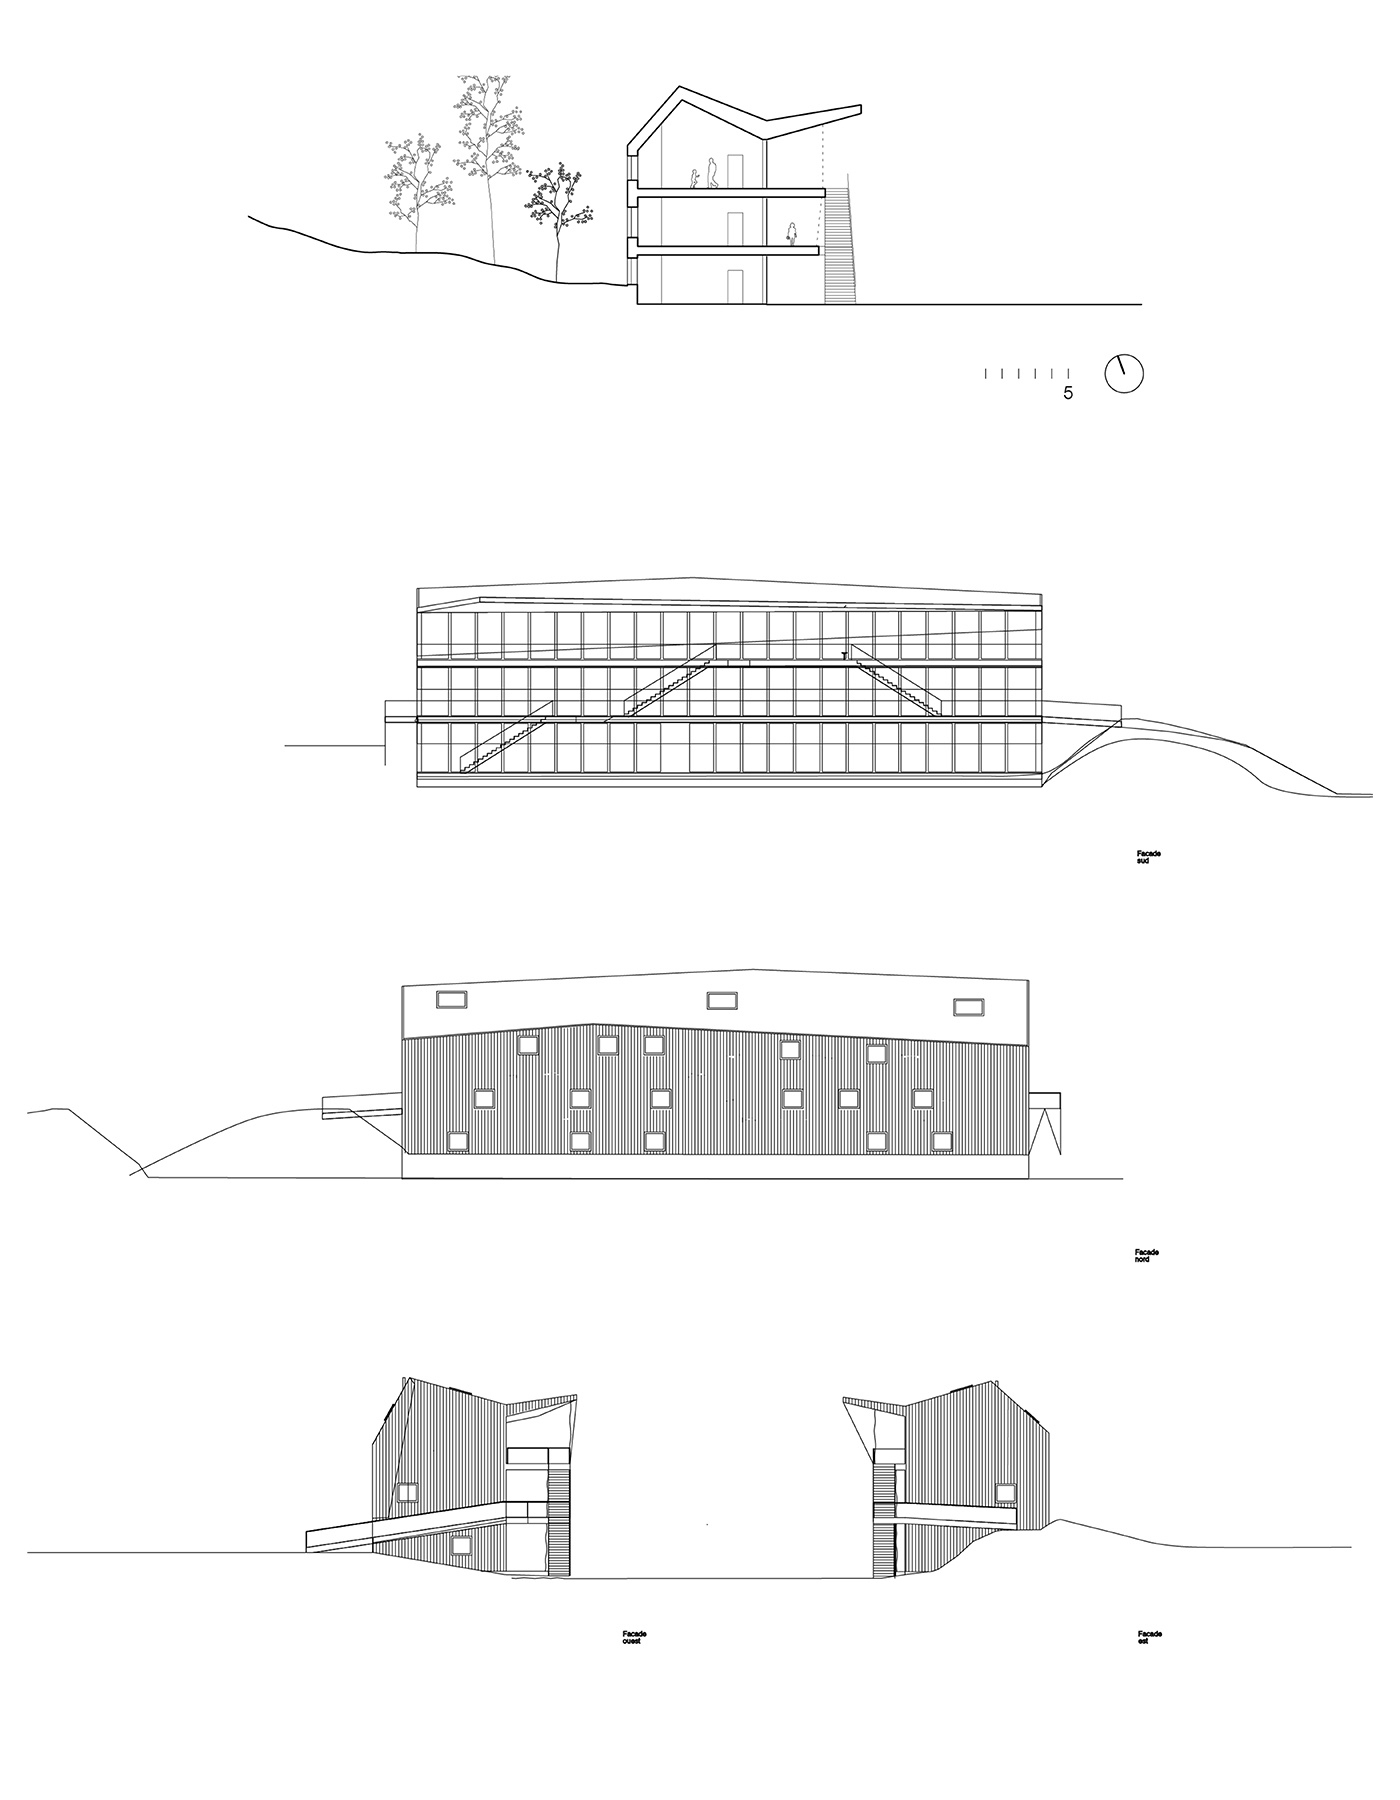 Steiner_section_elevations.jpg